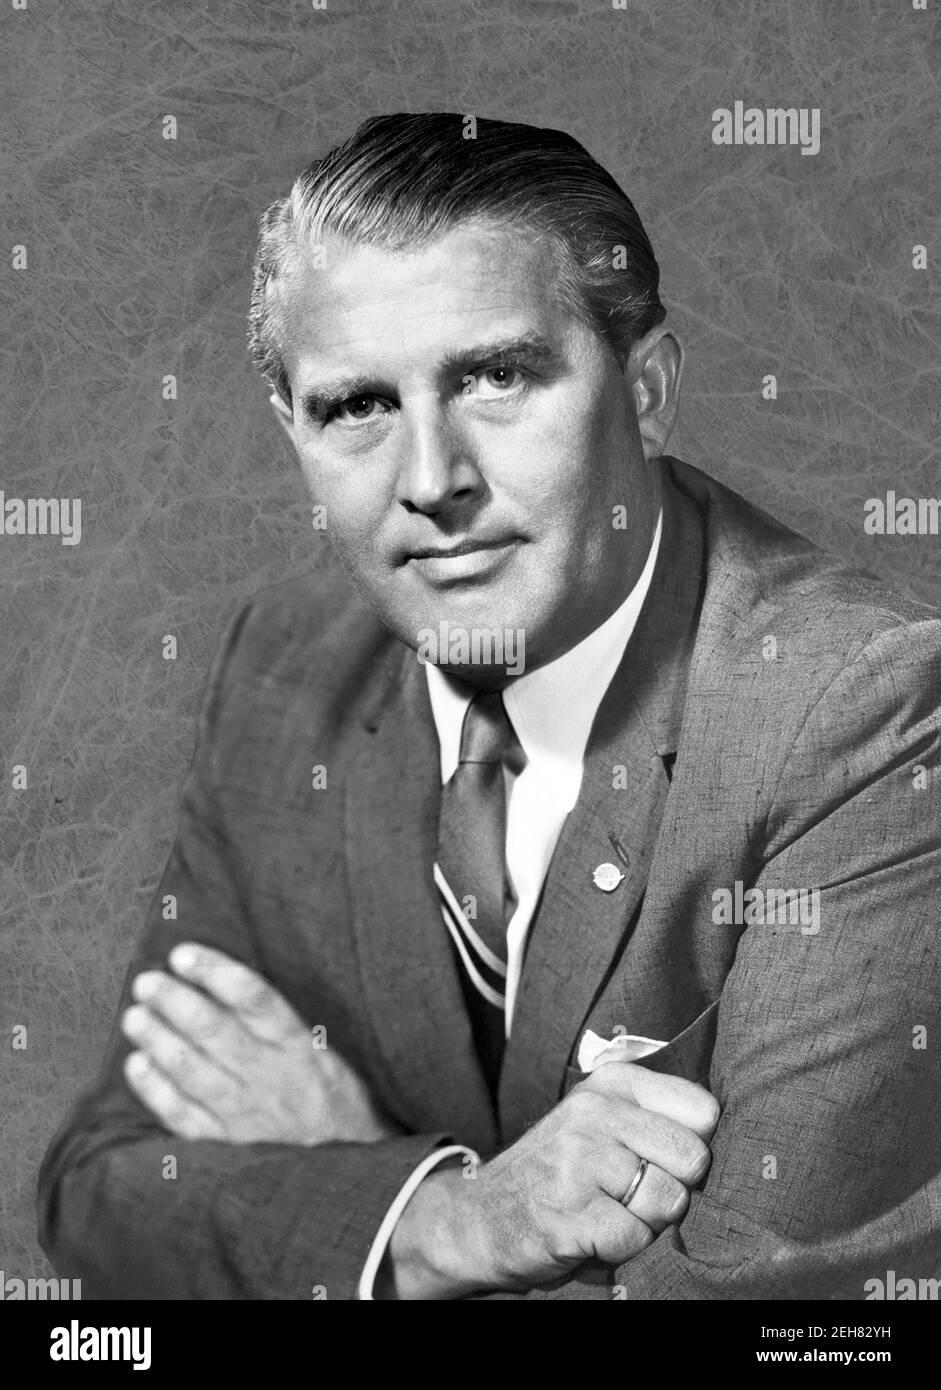 Wernher von Braun. Ritratto dell'ingegnere aerospaziale tedesco/americano e pioniere del razzo, .Wernher Magnus Maximilian Freiherr von Braun (1912-1977), 1960 Foto Stock